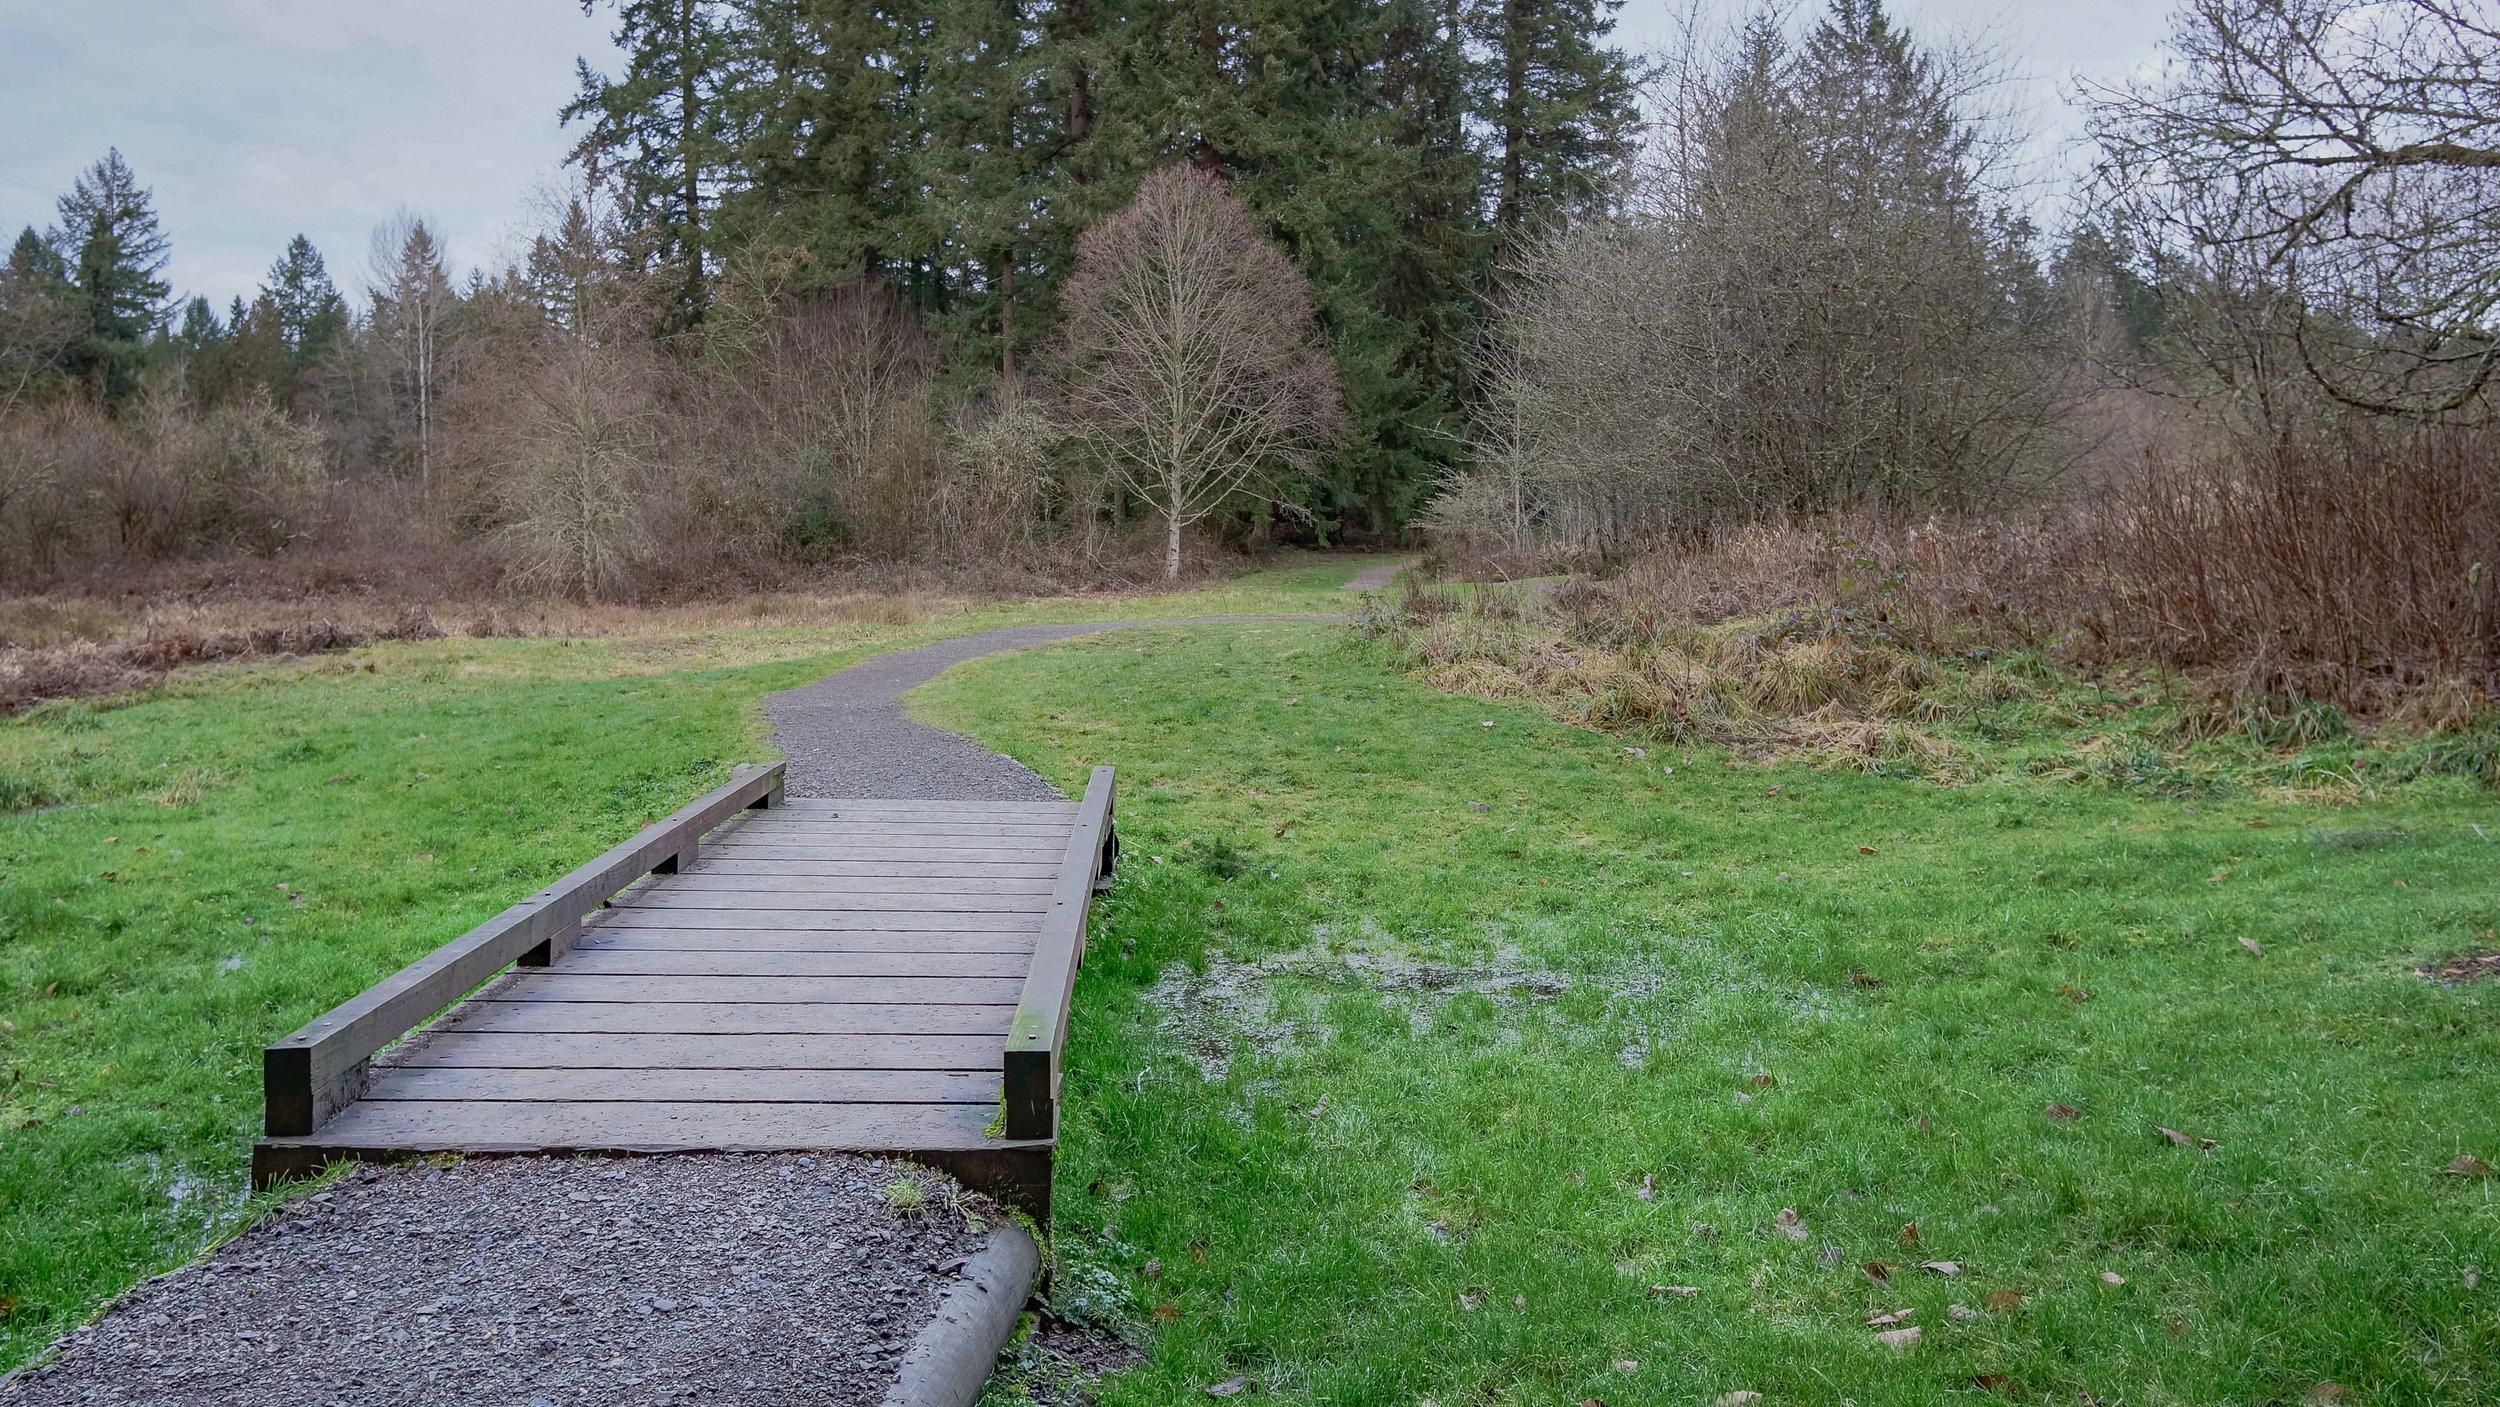 12. Evans Creek Preserve